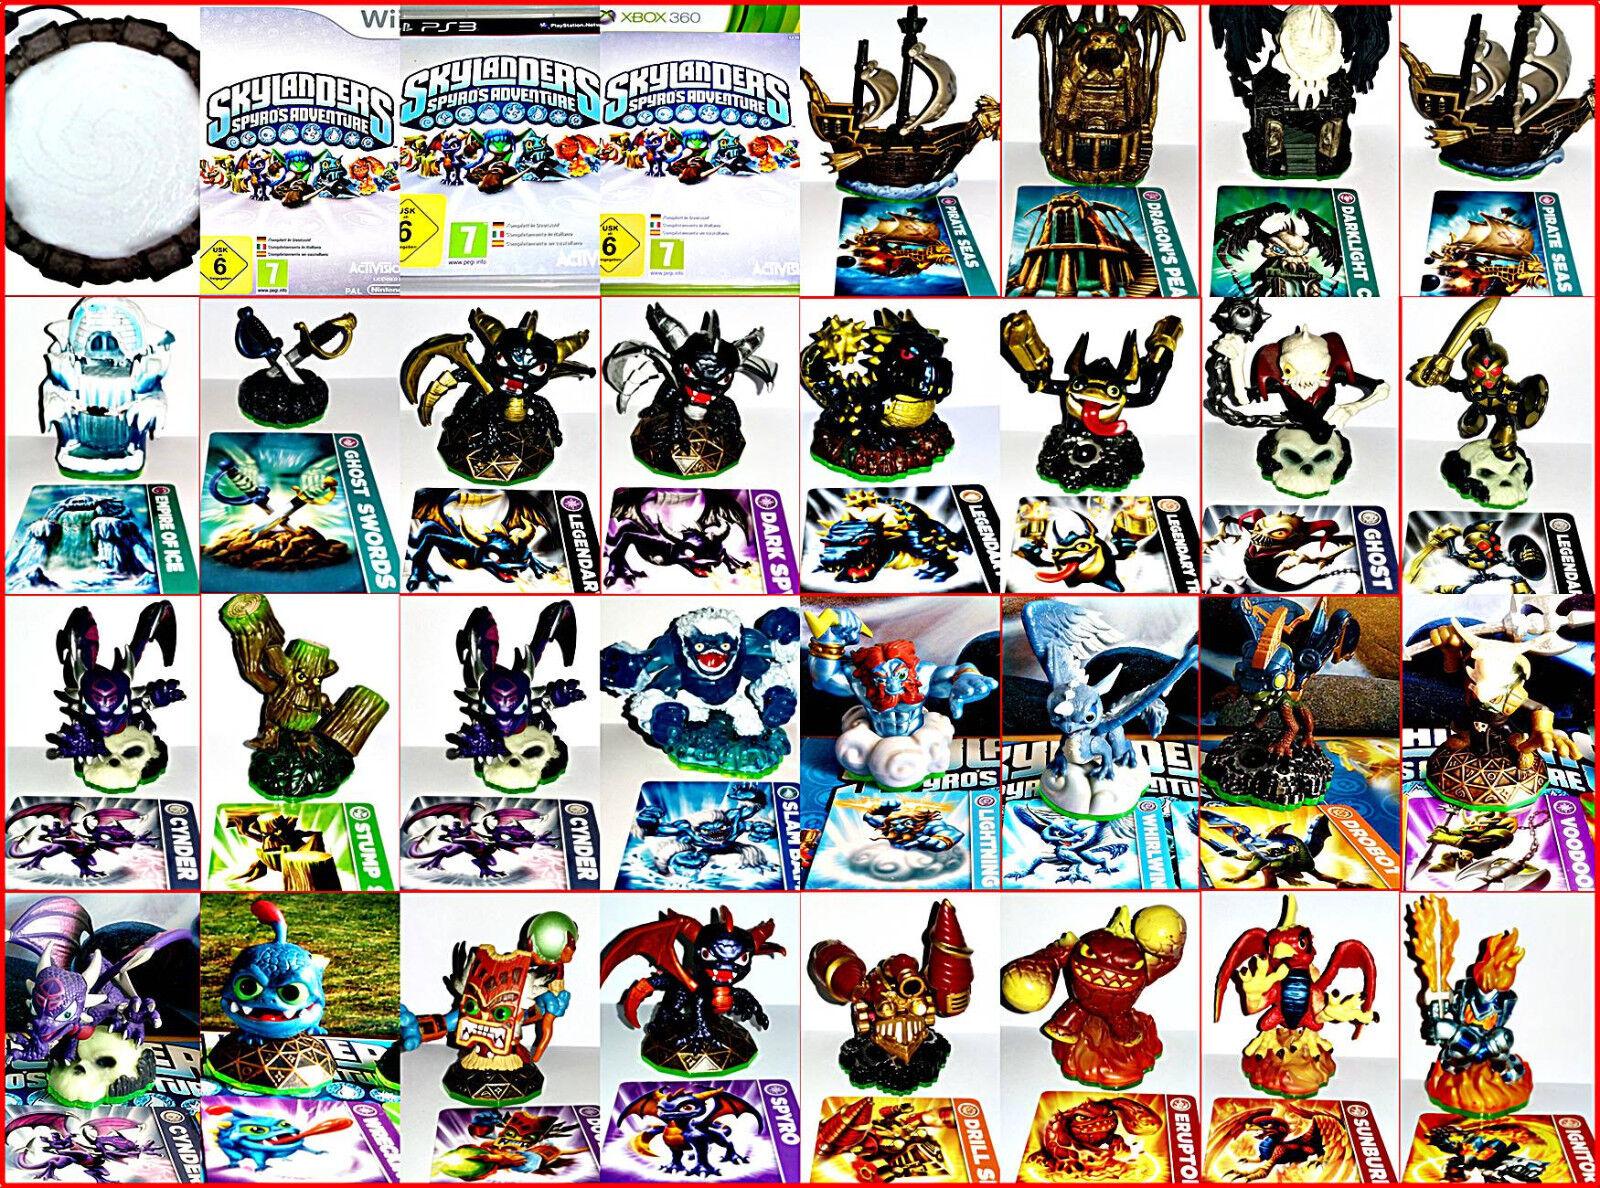 Skylanders Spyros Adventures Figurenauswahl per: Wii,Ps3,Ps4,Xbox,One,Dsi,U,